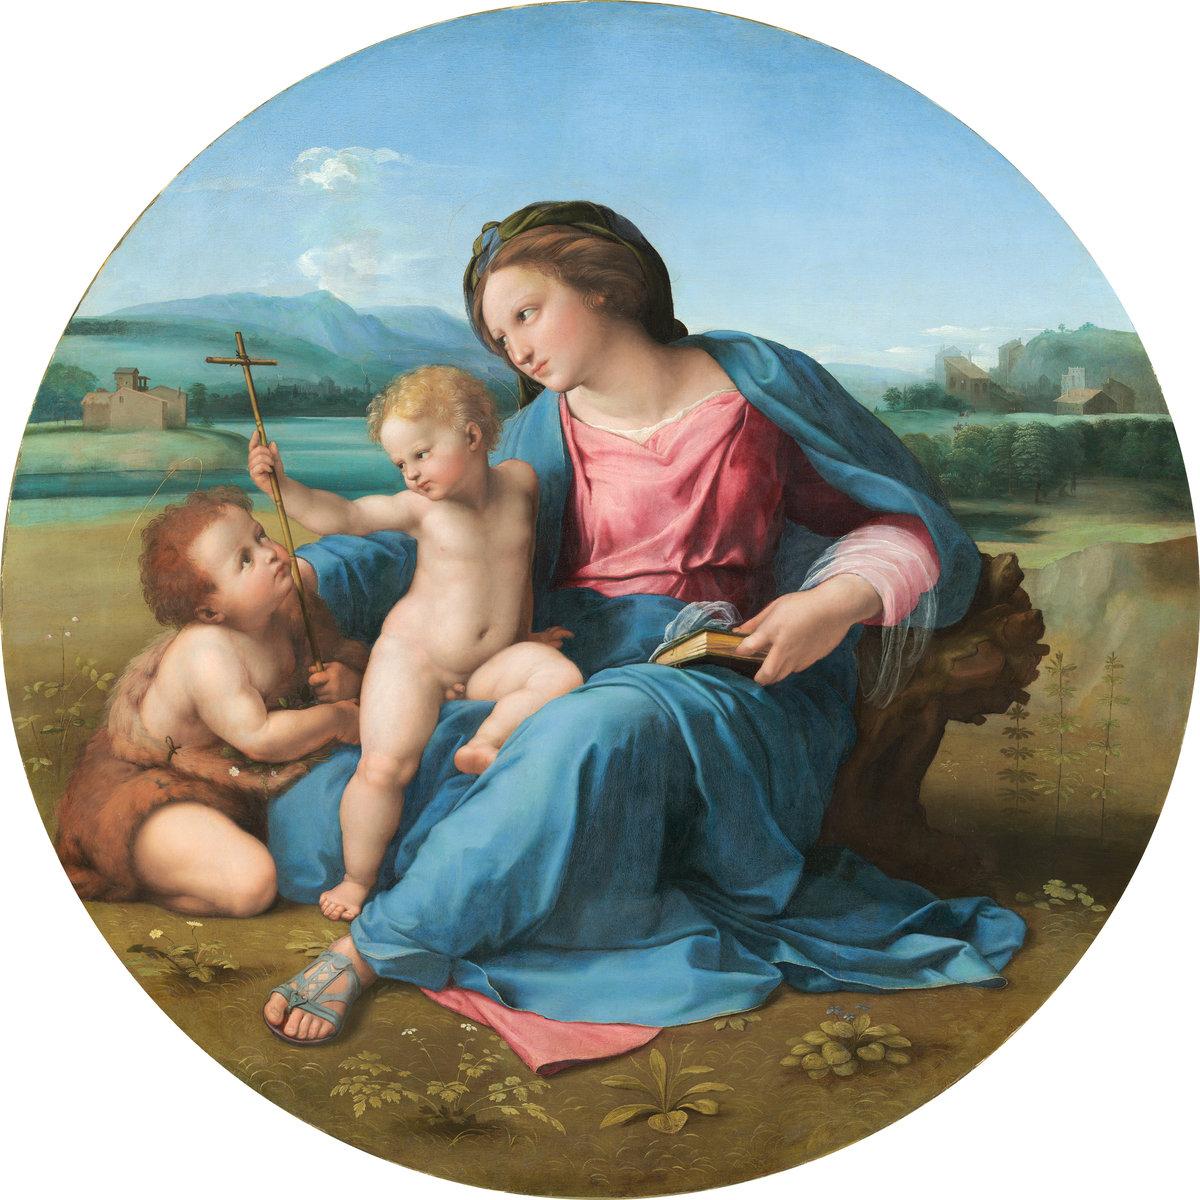 Raphael (Italian, 1483–1520), The Alba Madonna, ca. 1510. Oil on panel transferred to canvas. Courtesy National Gallery of Art, Washington.